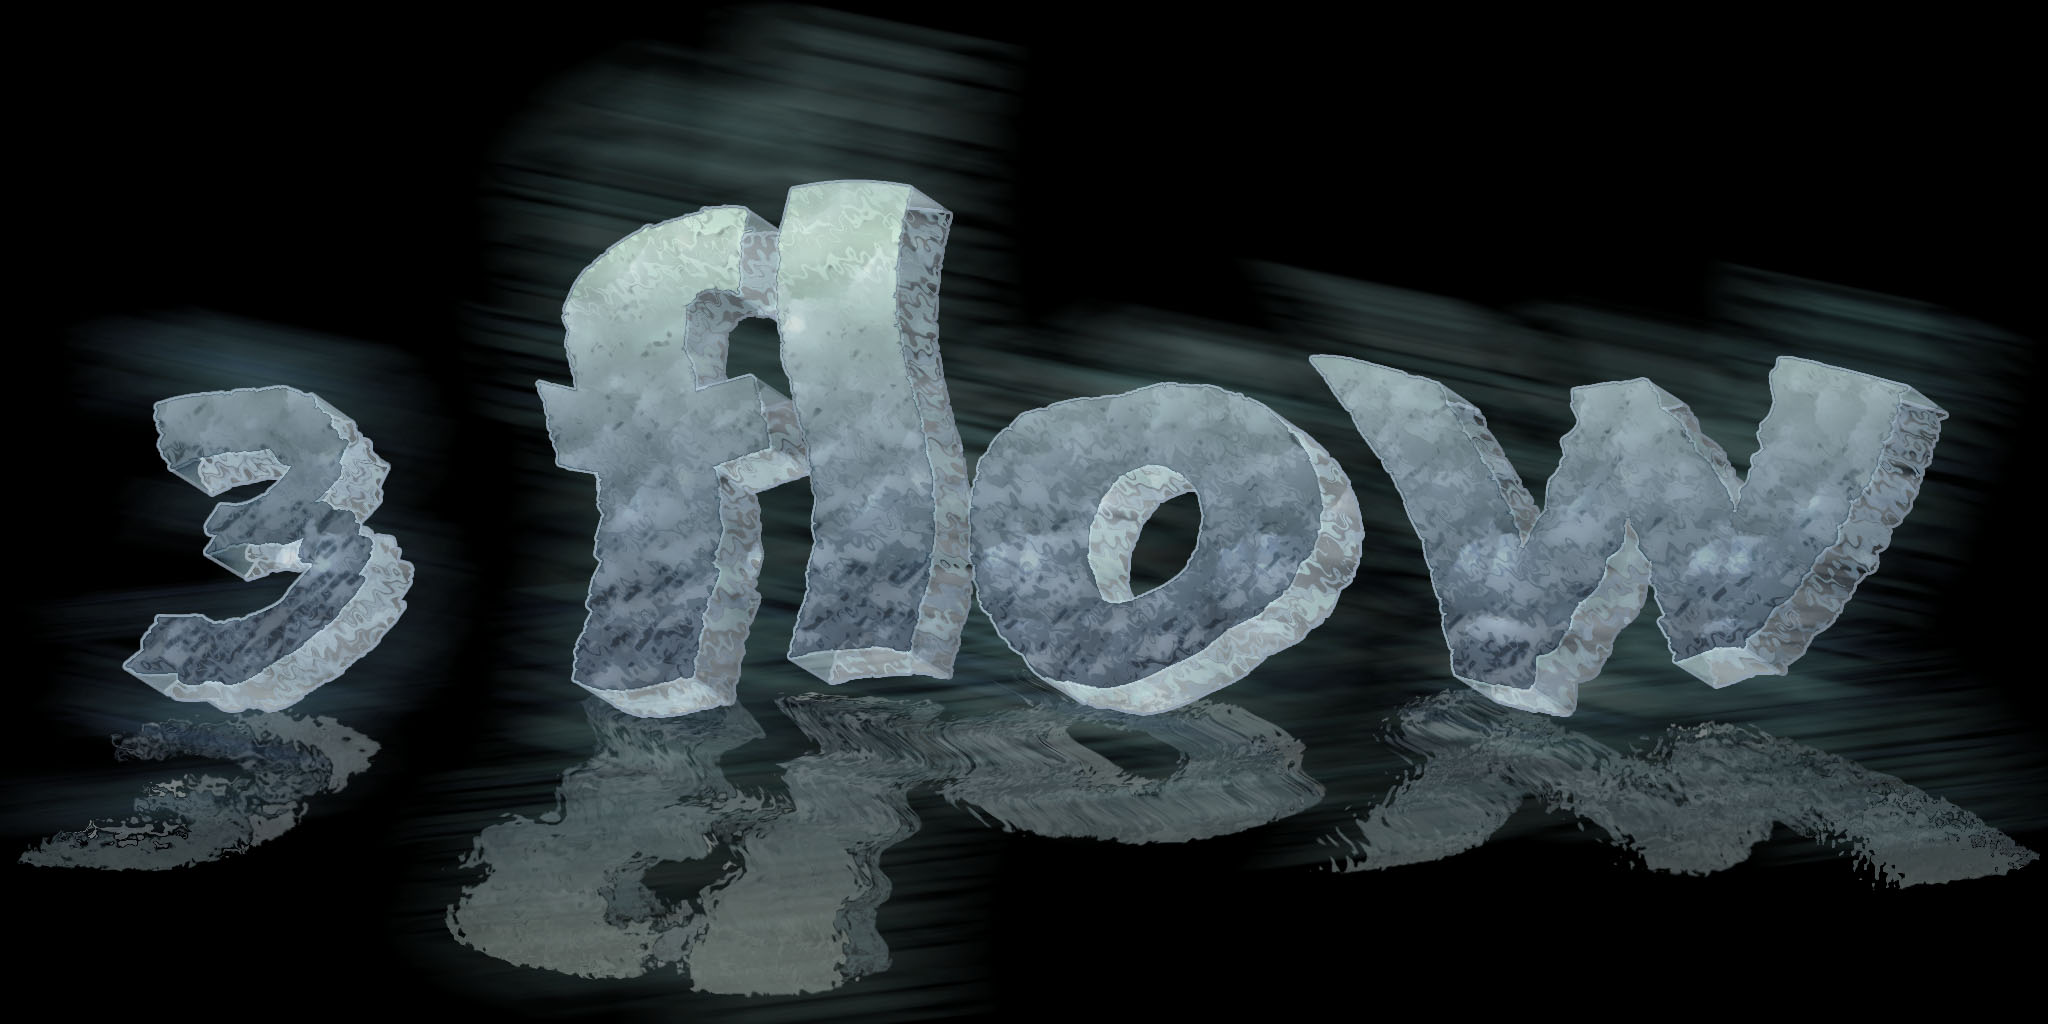 Logo Design by zigzag91 - Entry No. 131 in the Logo Design Contest Fun Logo Design for 3flow.